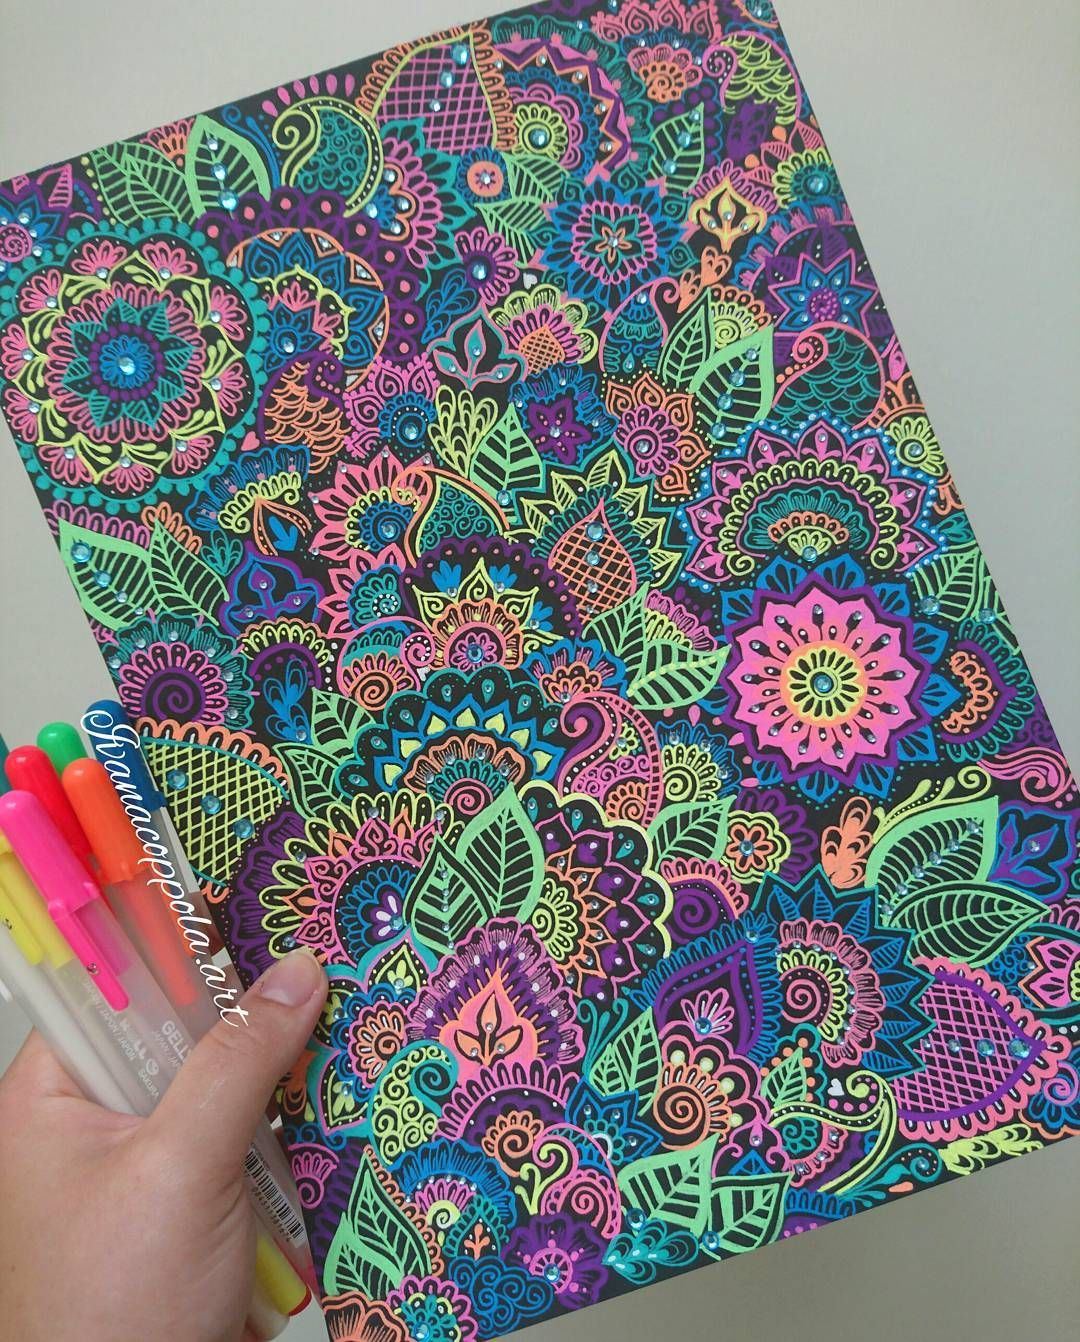 Smotrite Eto Foto Ot Ivanacoppola Art Na Instagram Otmetki Nravitsya 5 654 Gel Pen Art Pen Art Sharpie Art